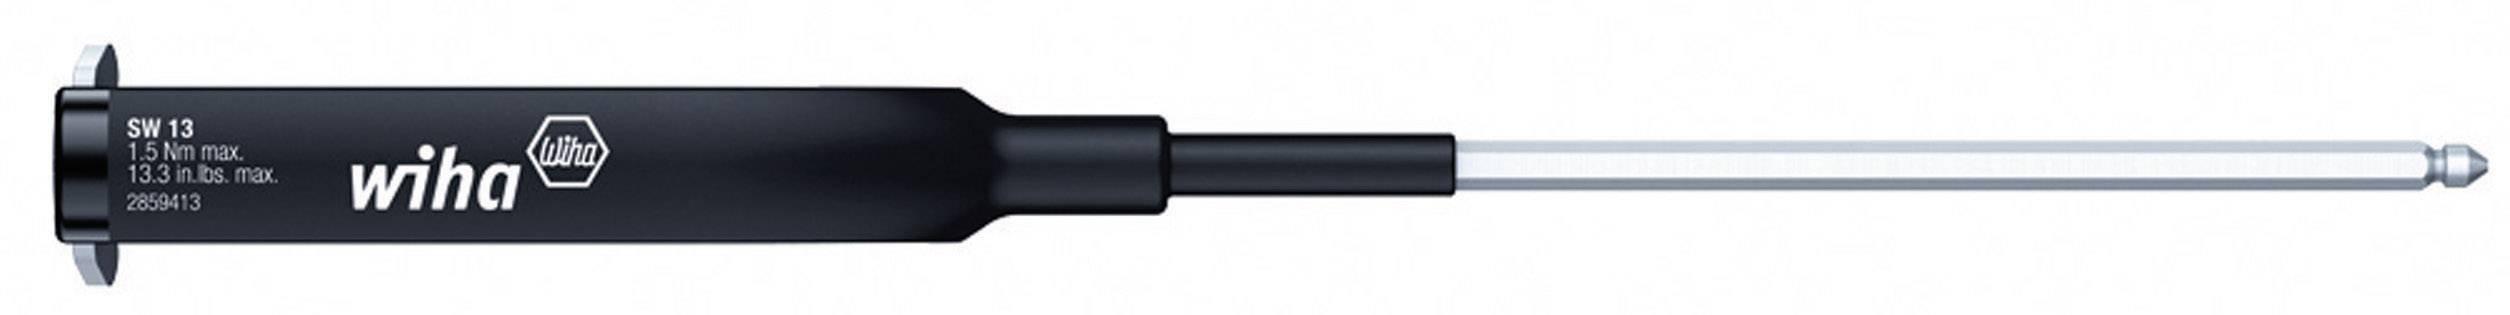 Bit momentového kľúča Wiha Torque 2859 36418, 218 mm